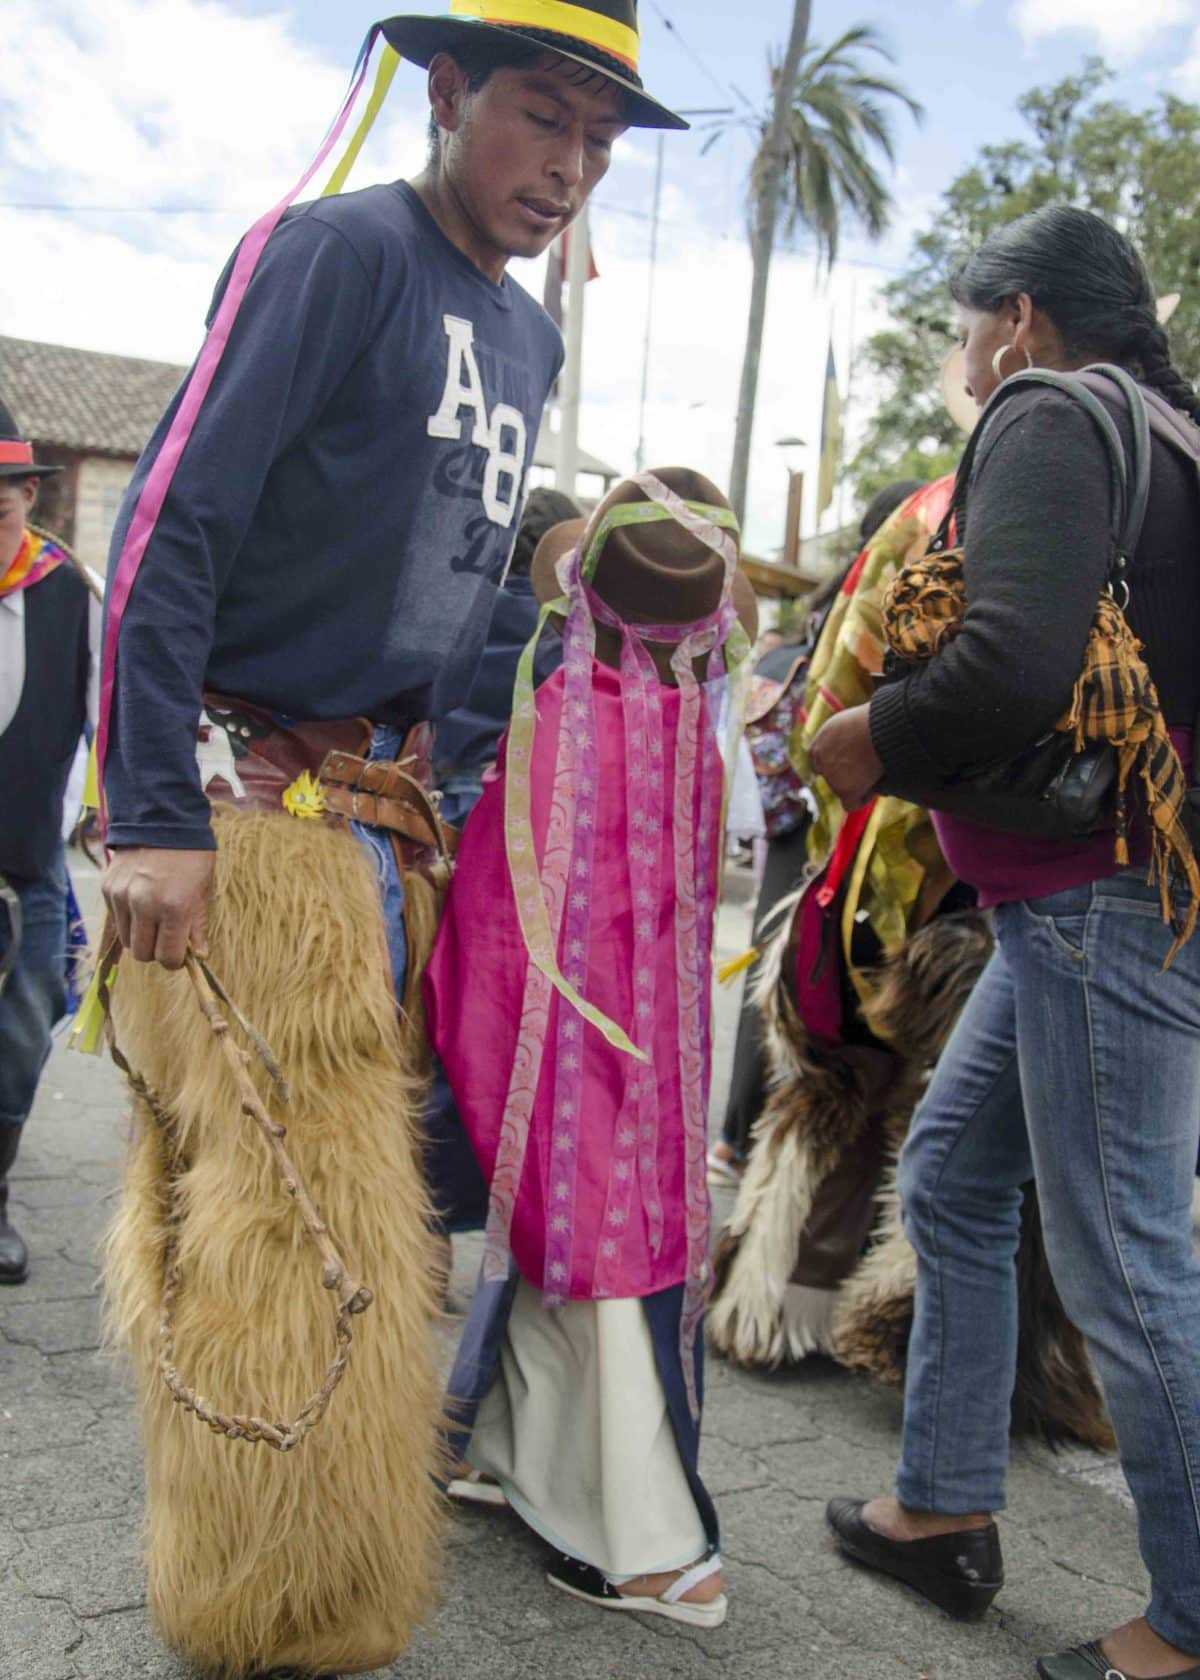 Dancers, Taking of the Plaza, School Children Day, Cotacachi, Ecuador